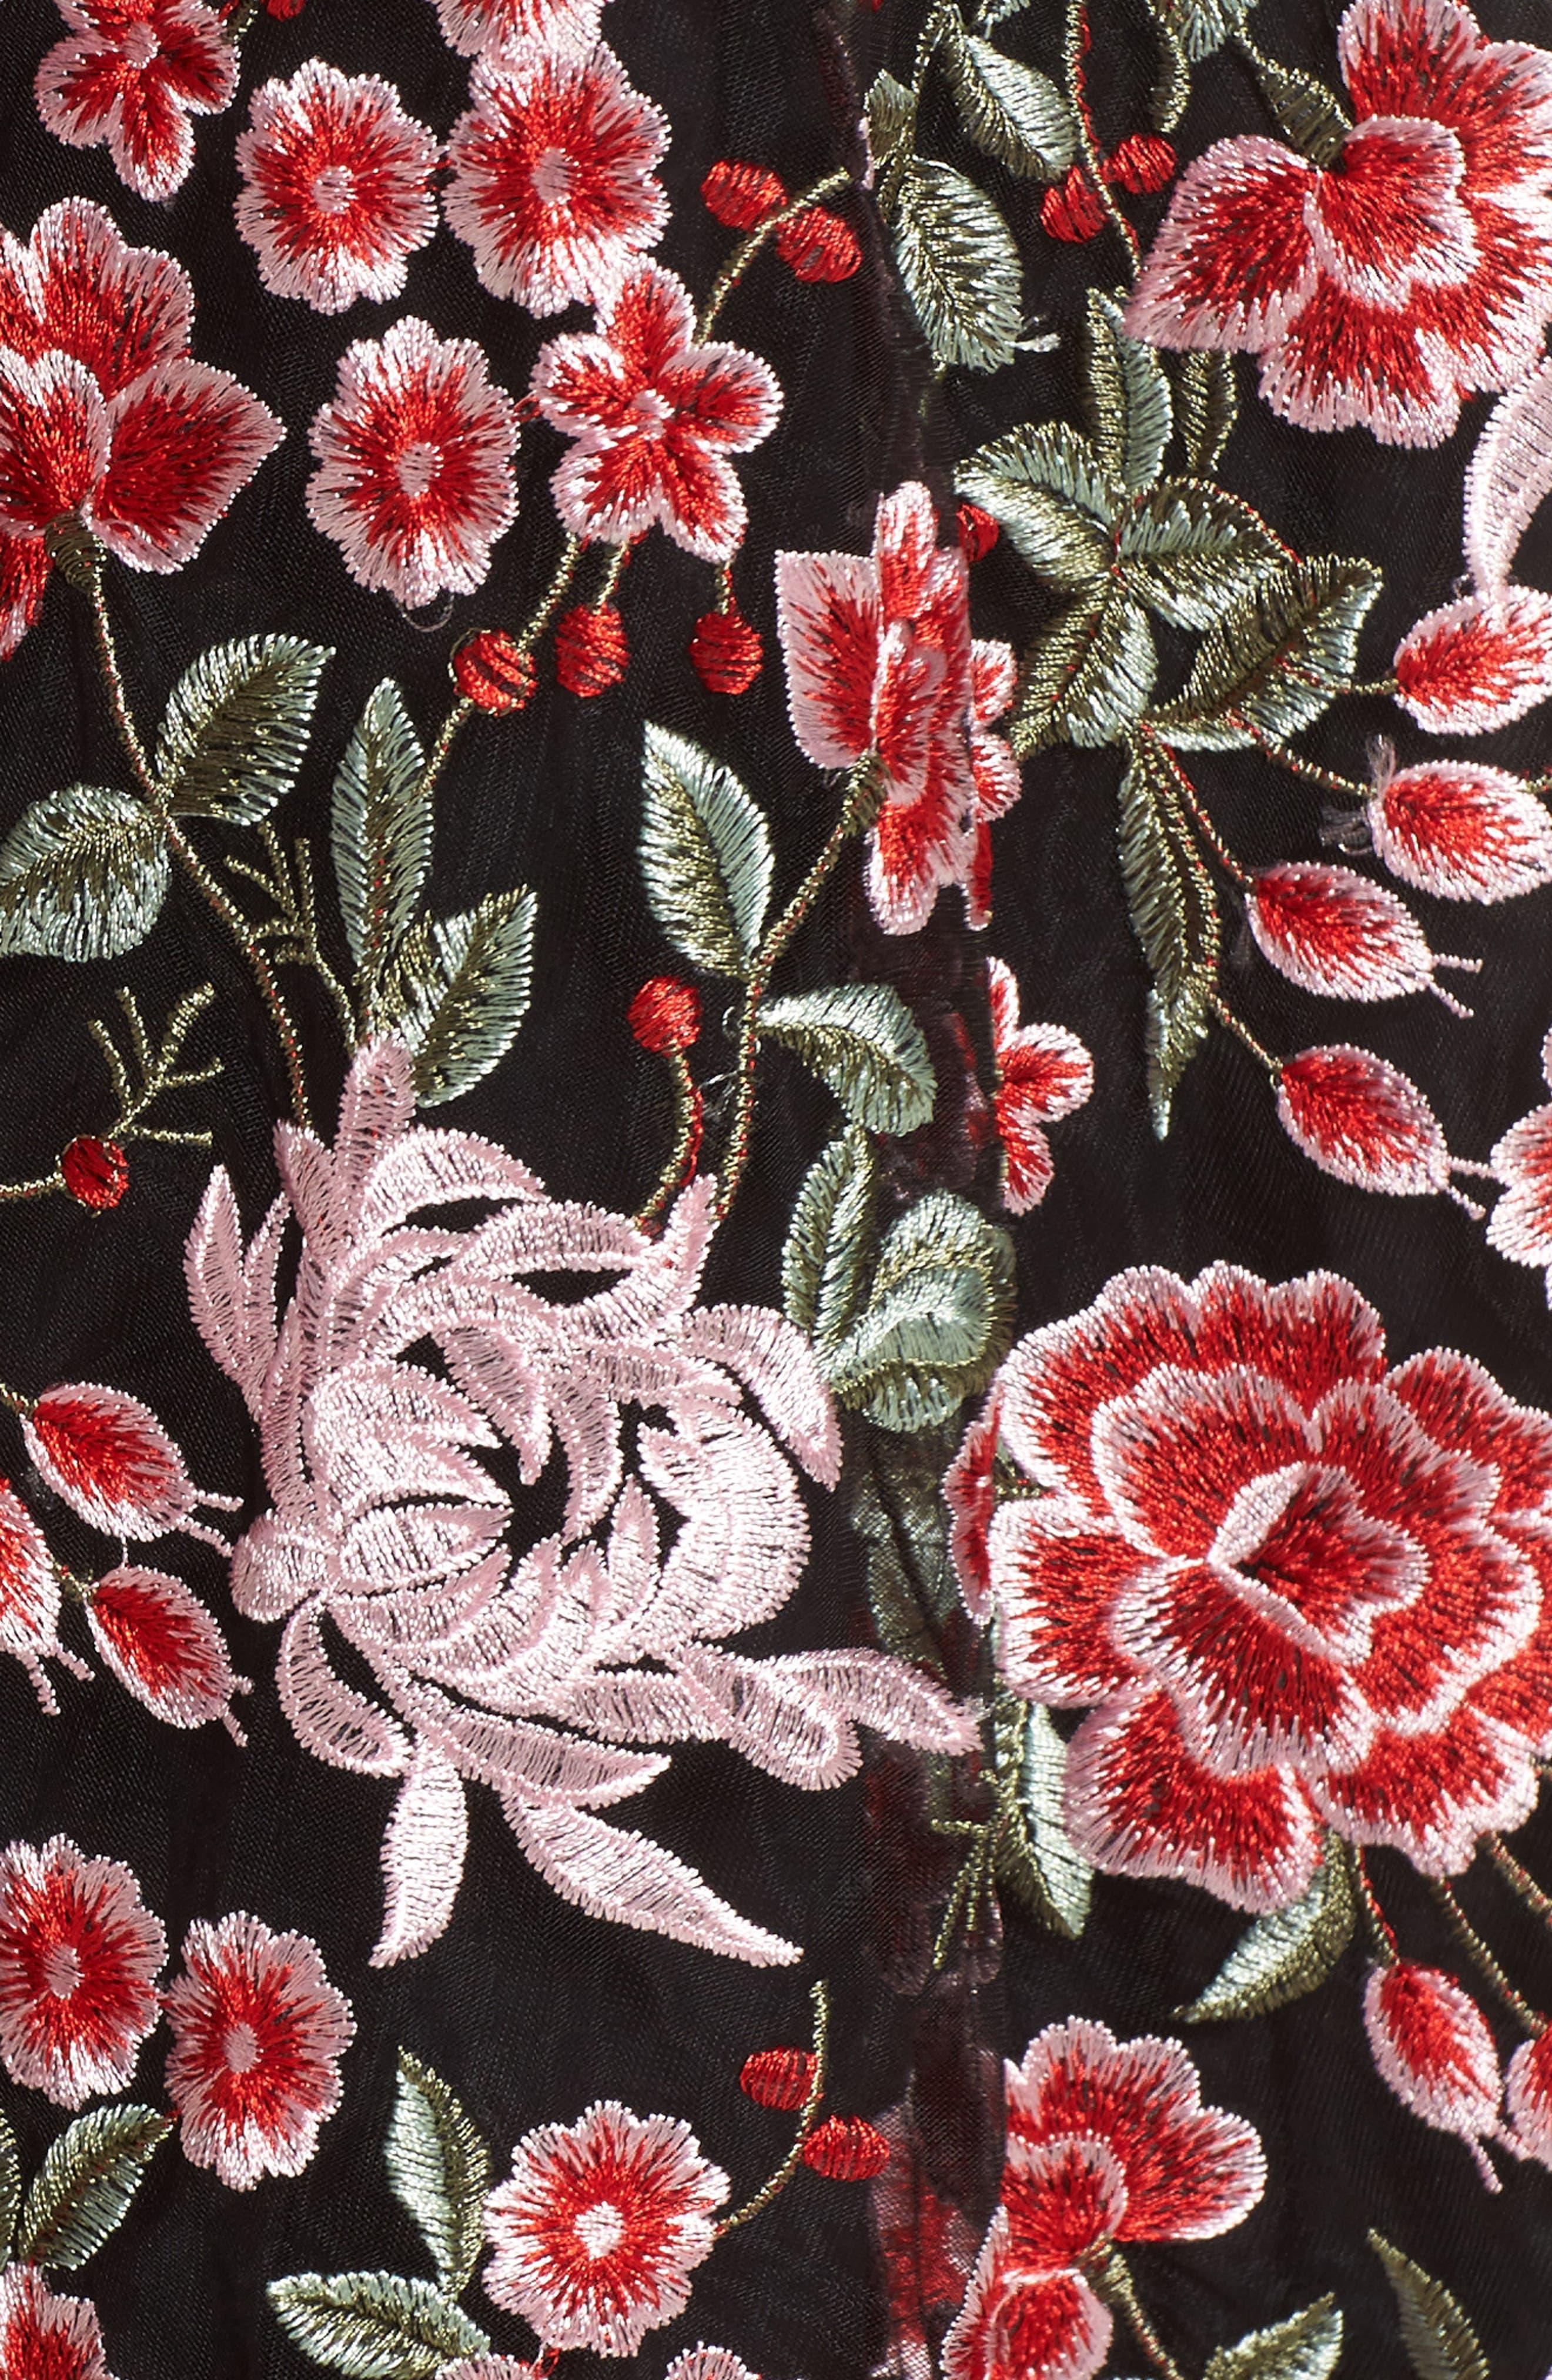 Cosette Embroidered Strapless Dress,                             Alternate thumbnail 5, color,                             Black Multi